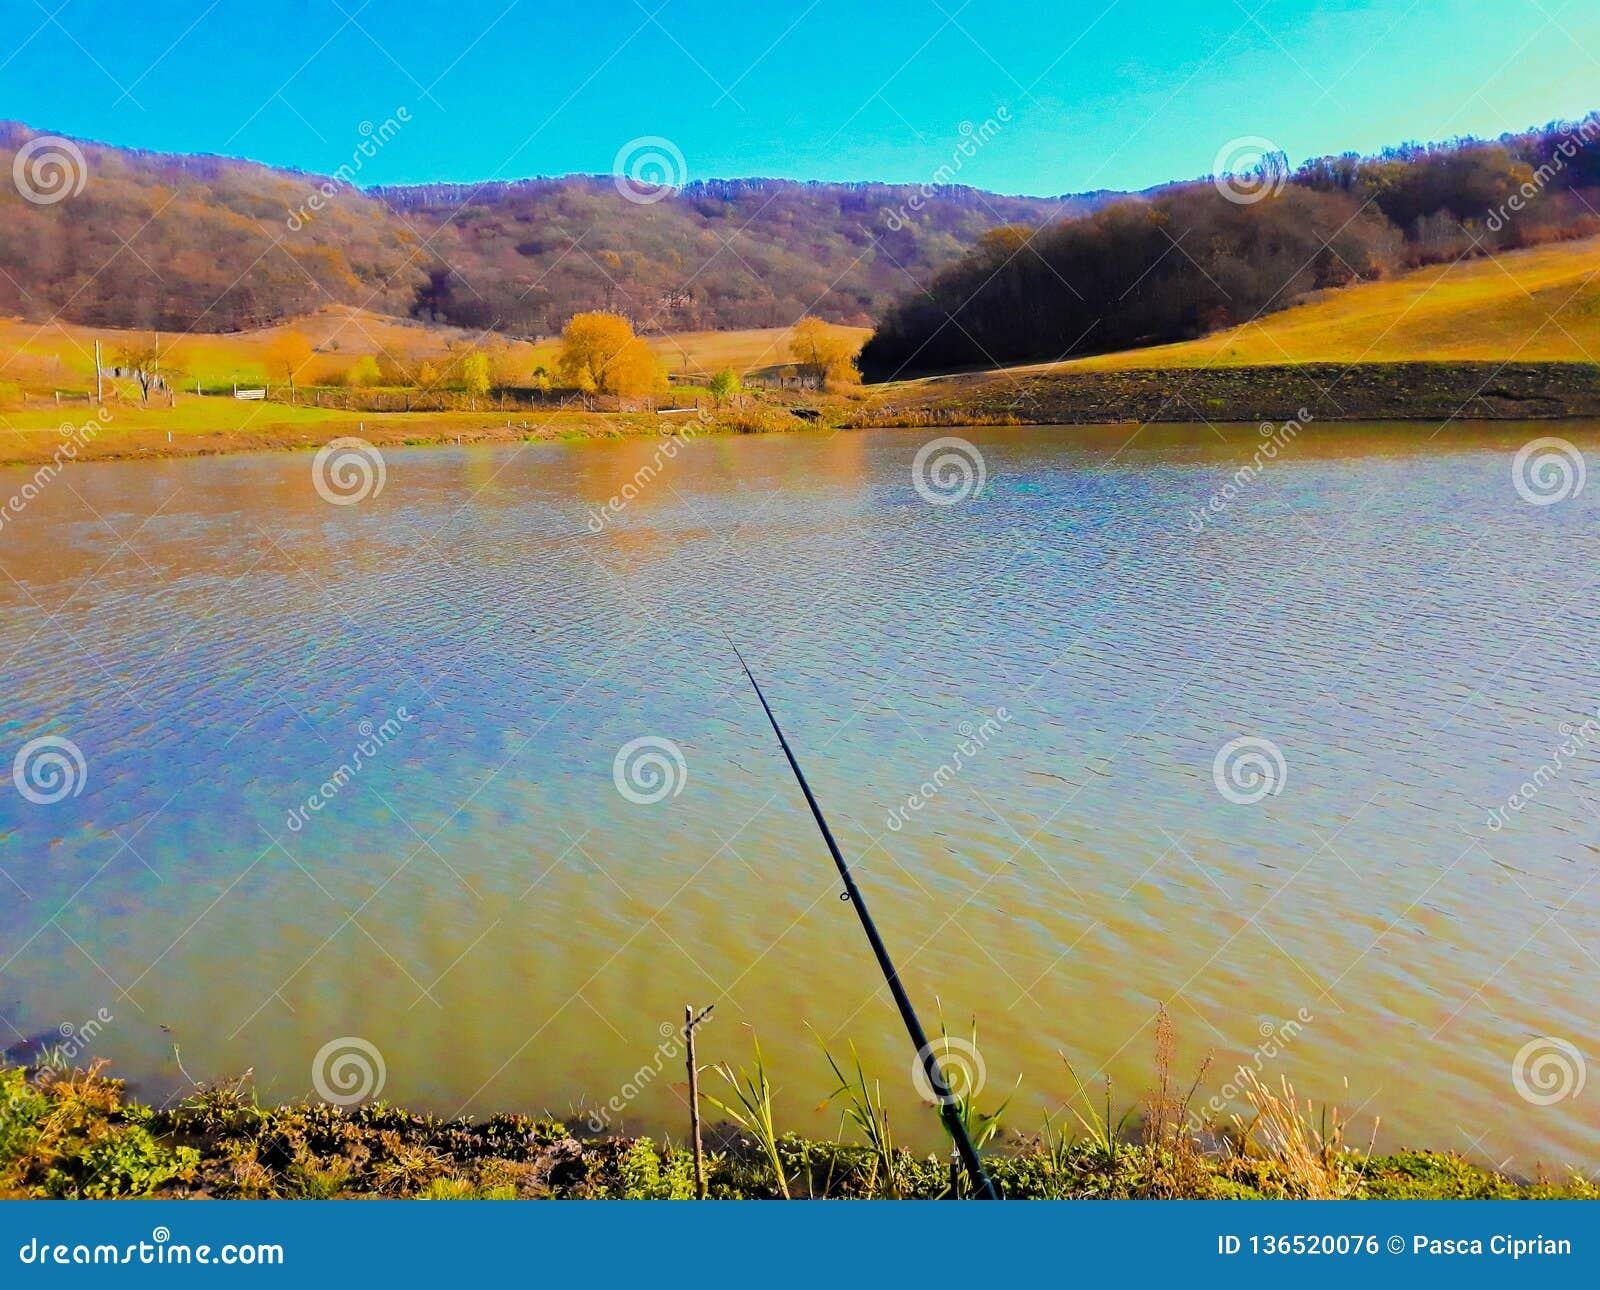 The nature stock photo  Image of unusual, lake, apus - 136520076